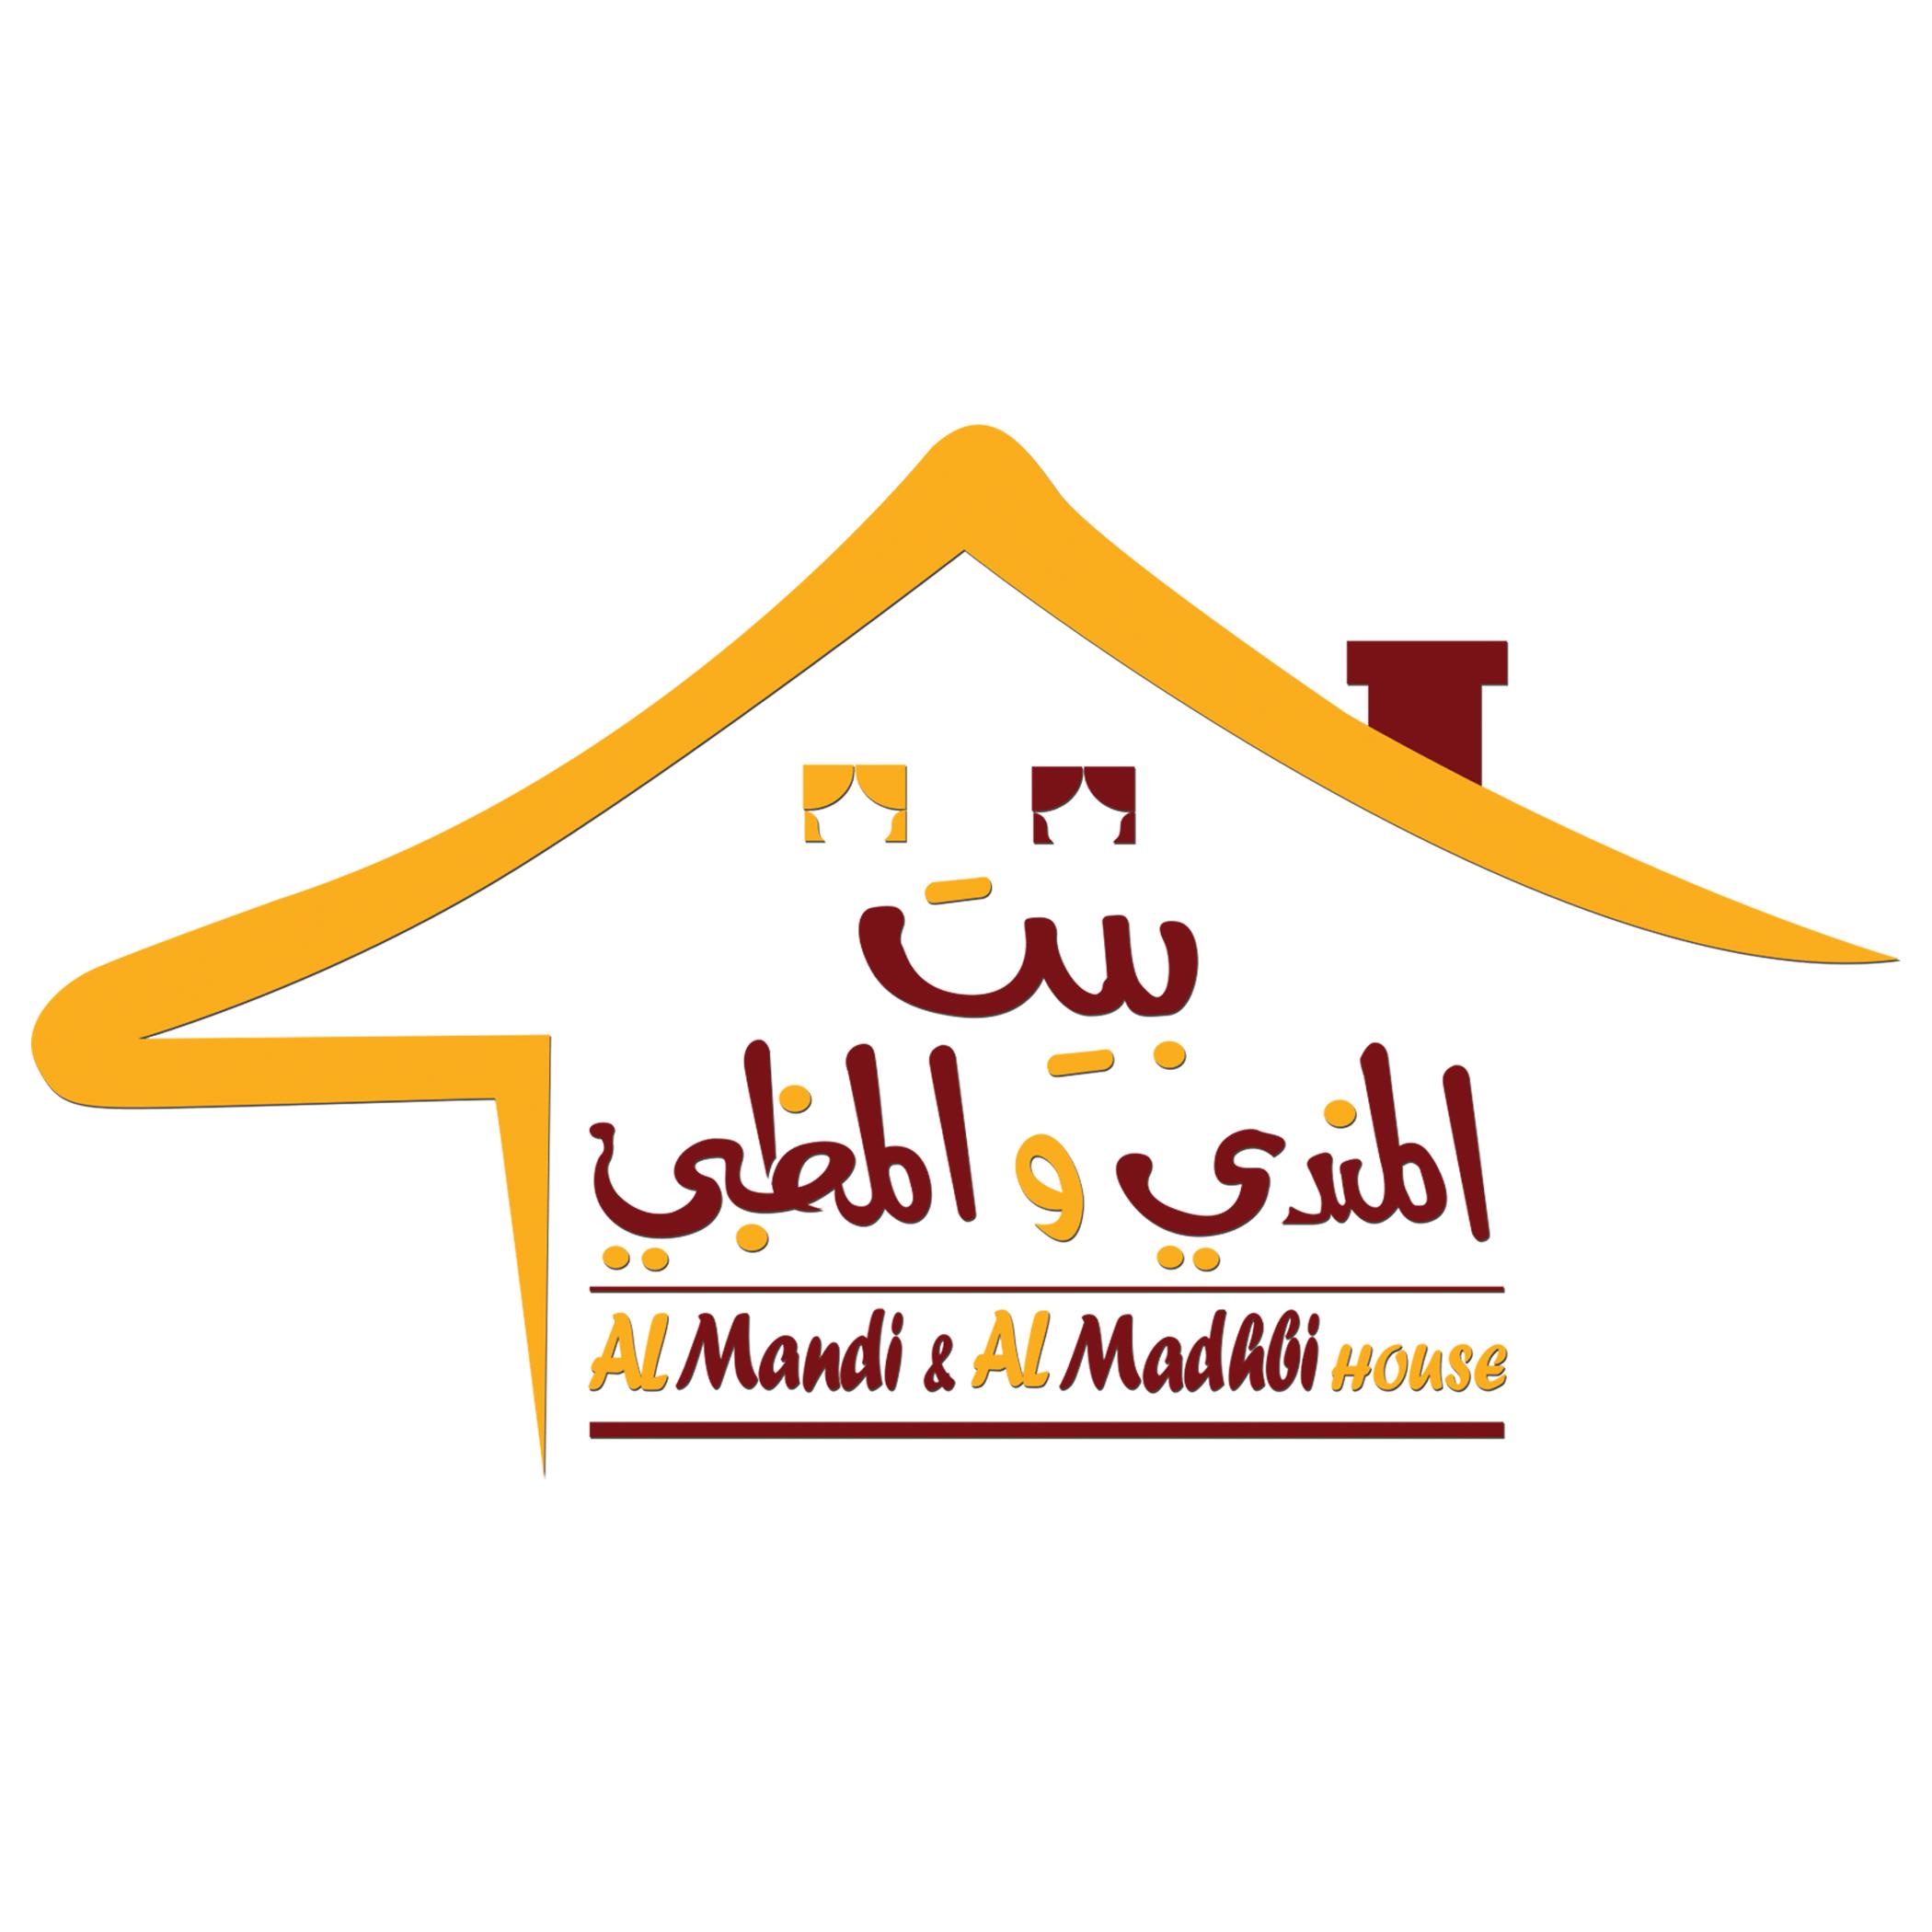 Al Mandi & Al Madhbi House